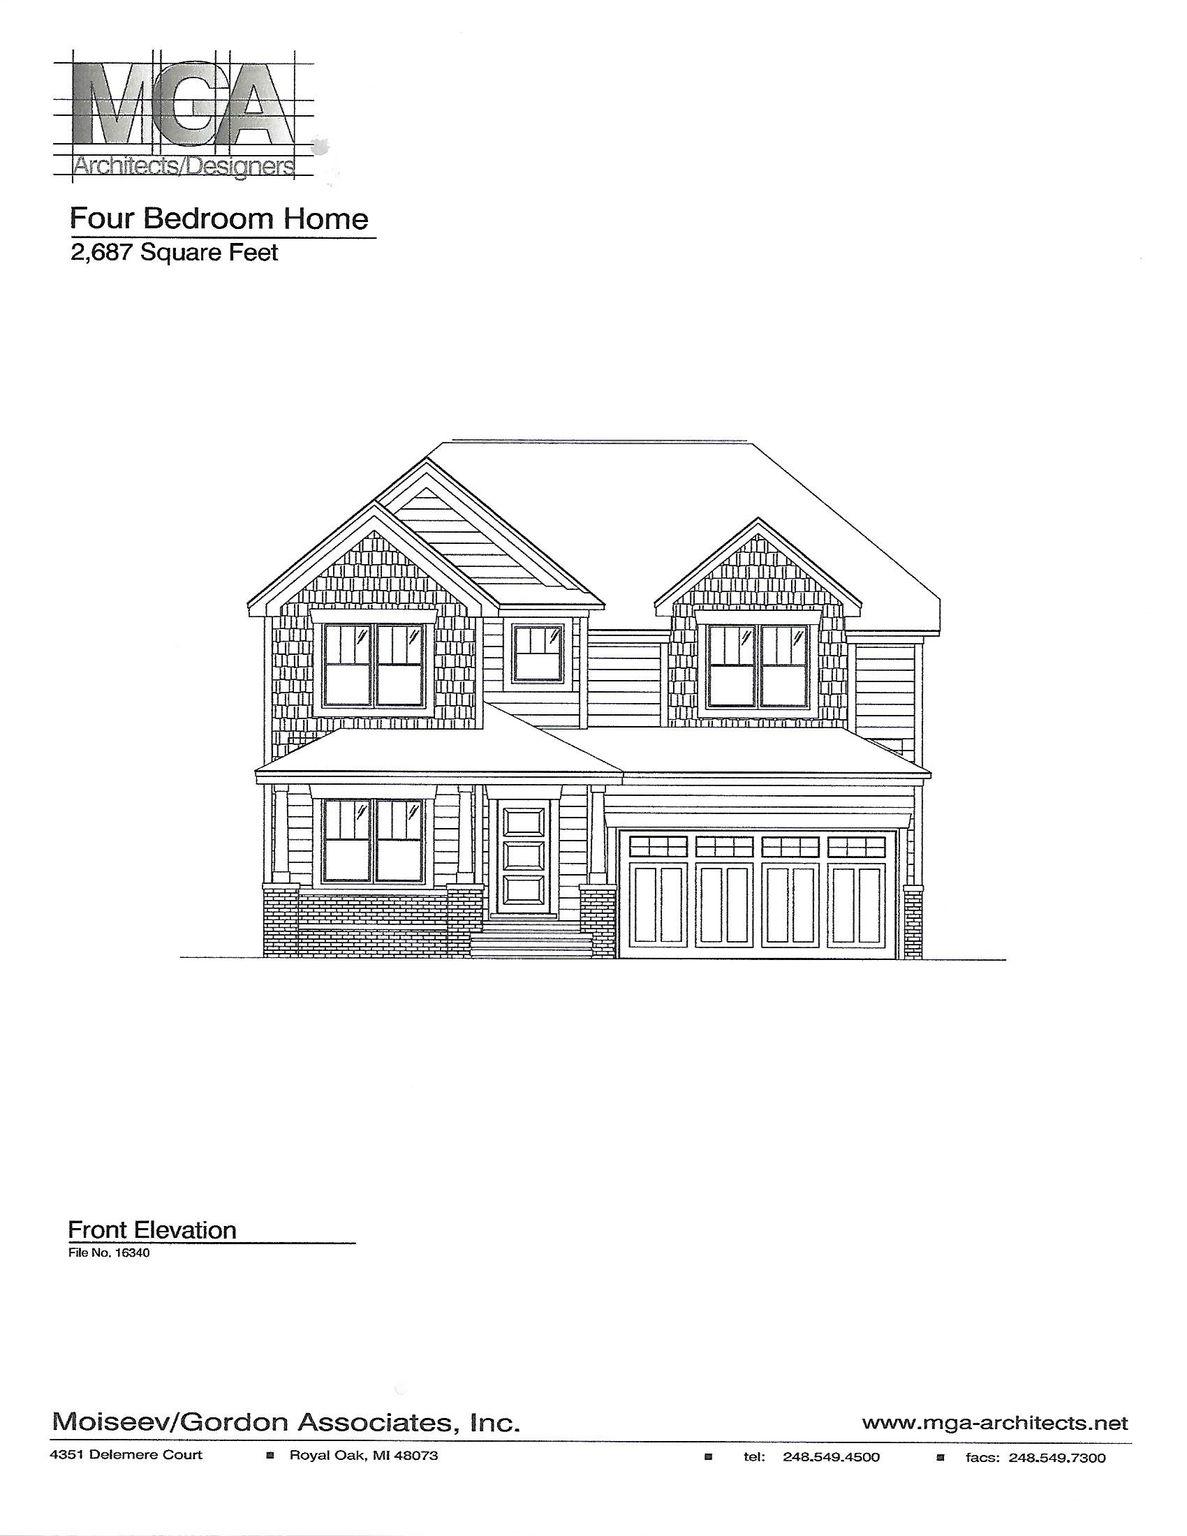 1612 N Maple Ave, Royal Oak, MI 48067 - Estimate and Home Details ...